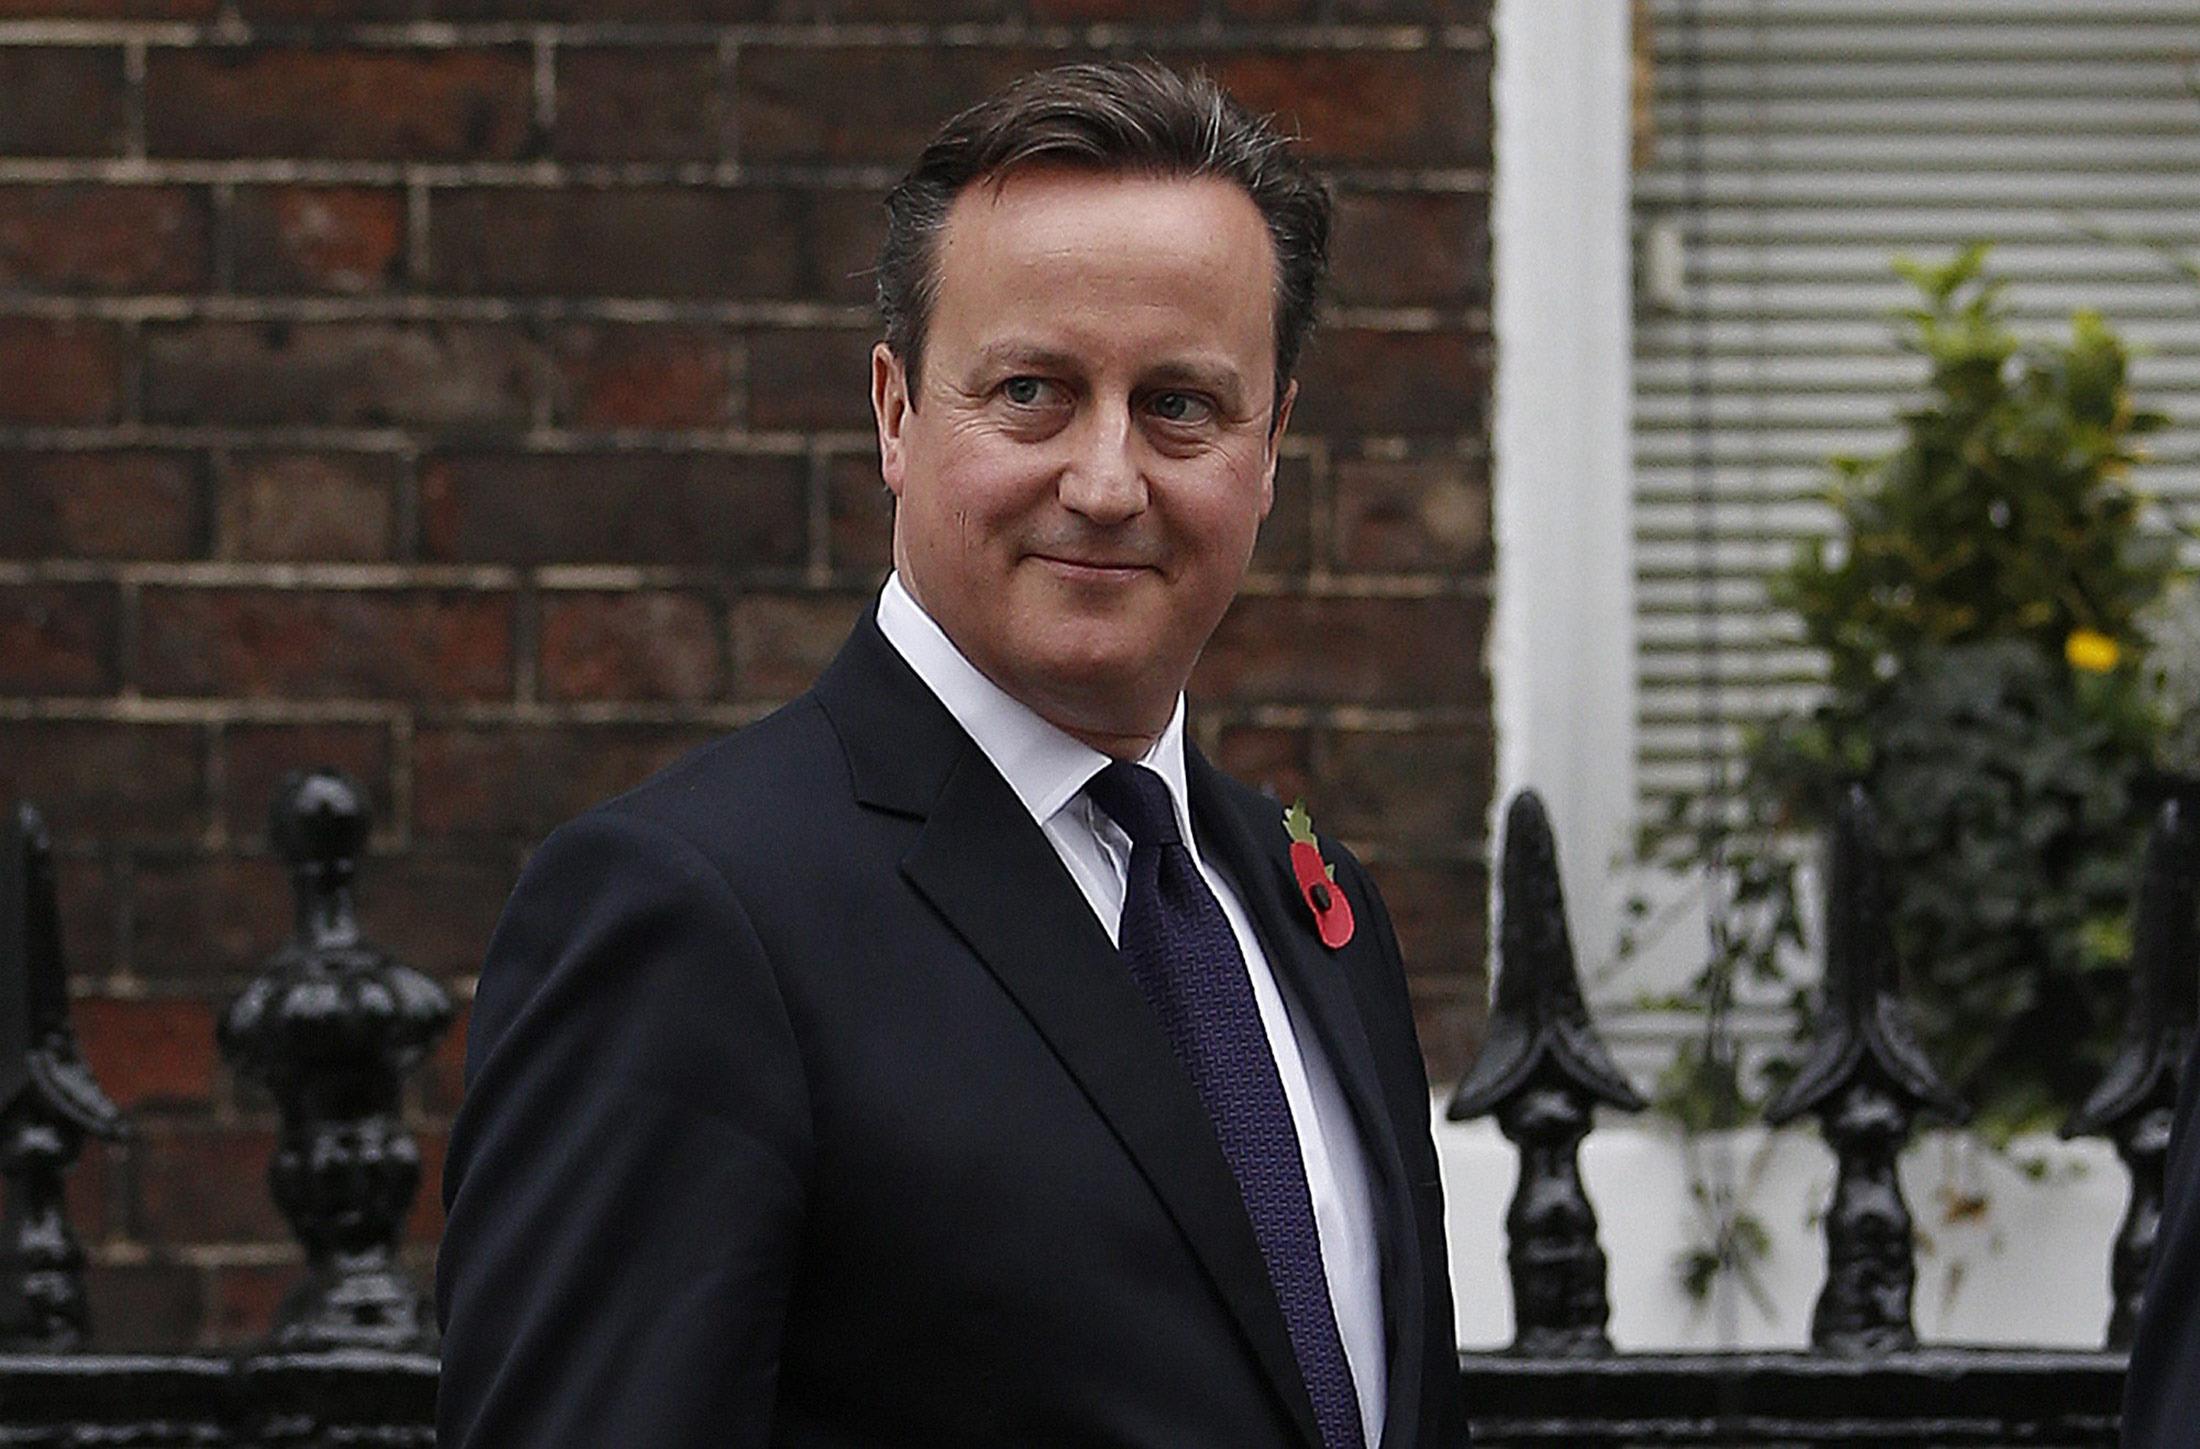 David Cameron Wallpapers